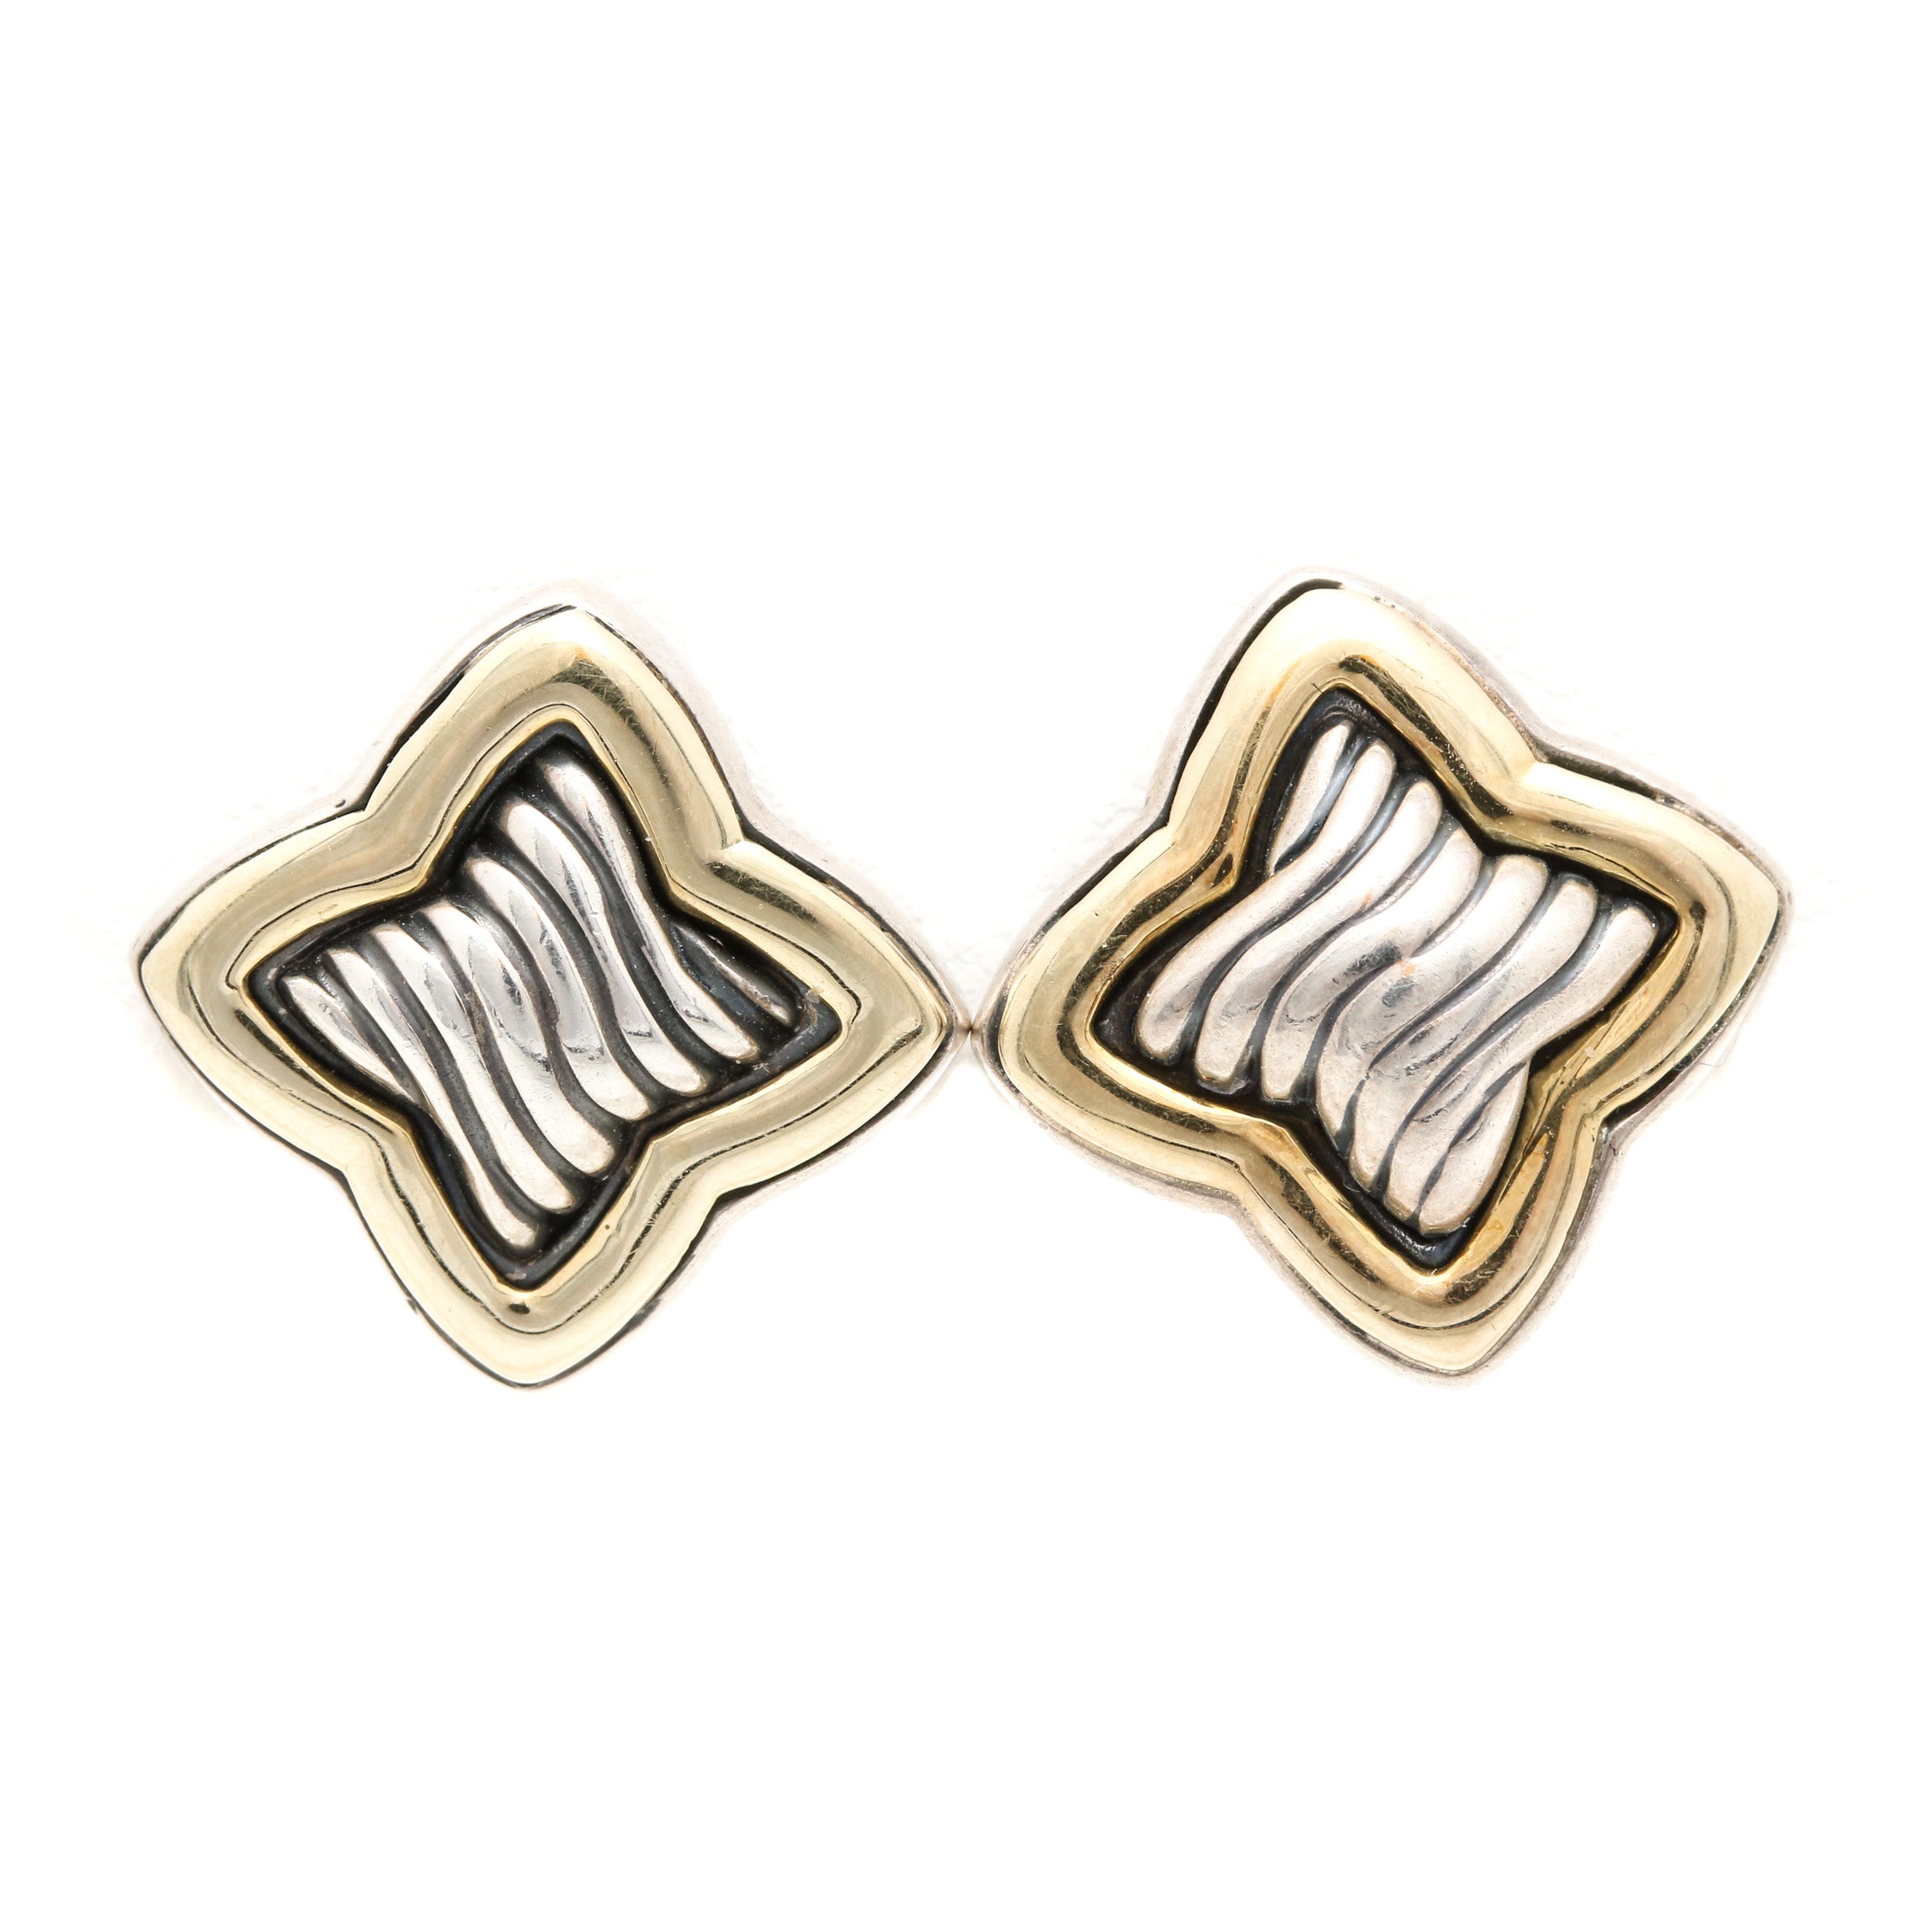 David Yurman Sterling Silver And 18K Yellow Gold Quatrefoil Earrings